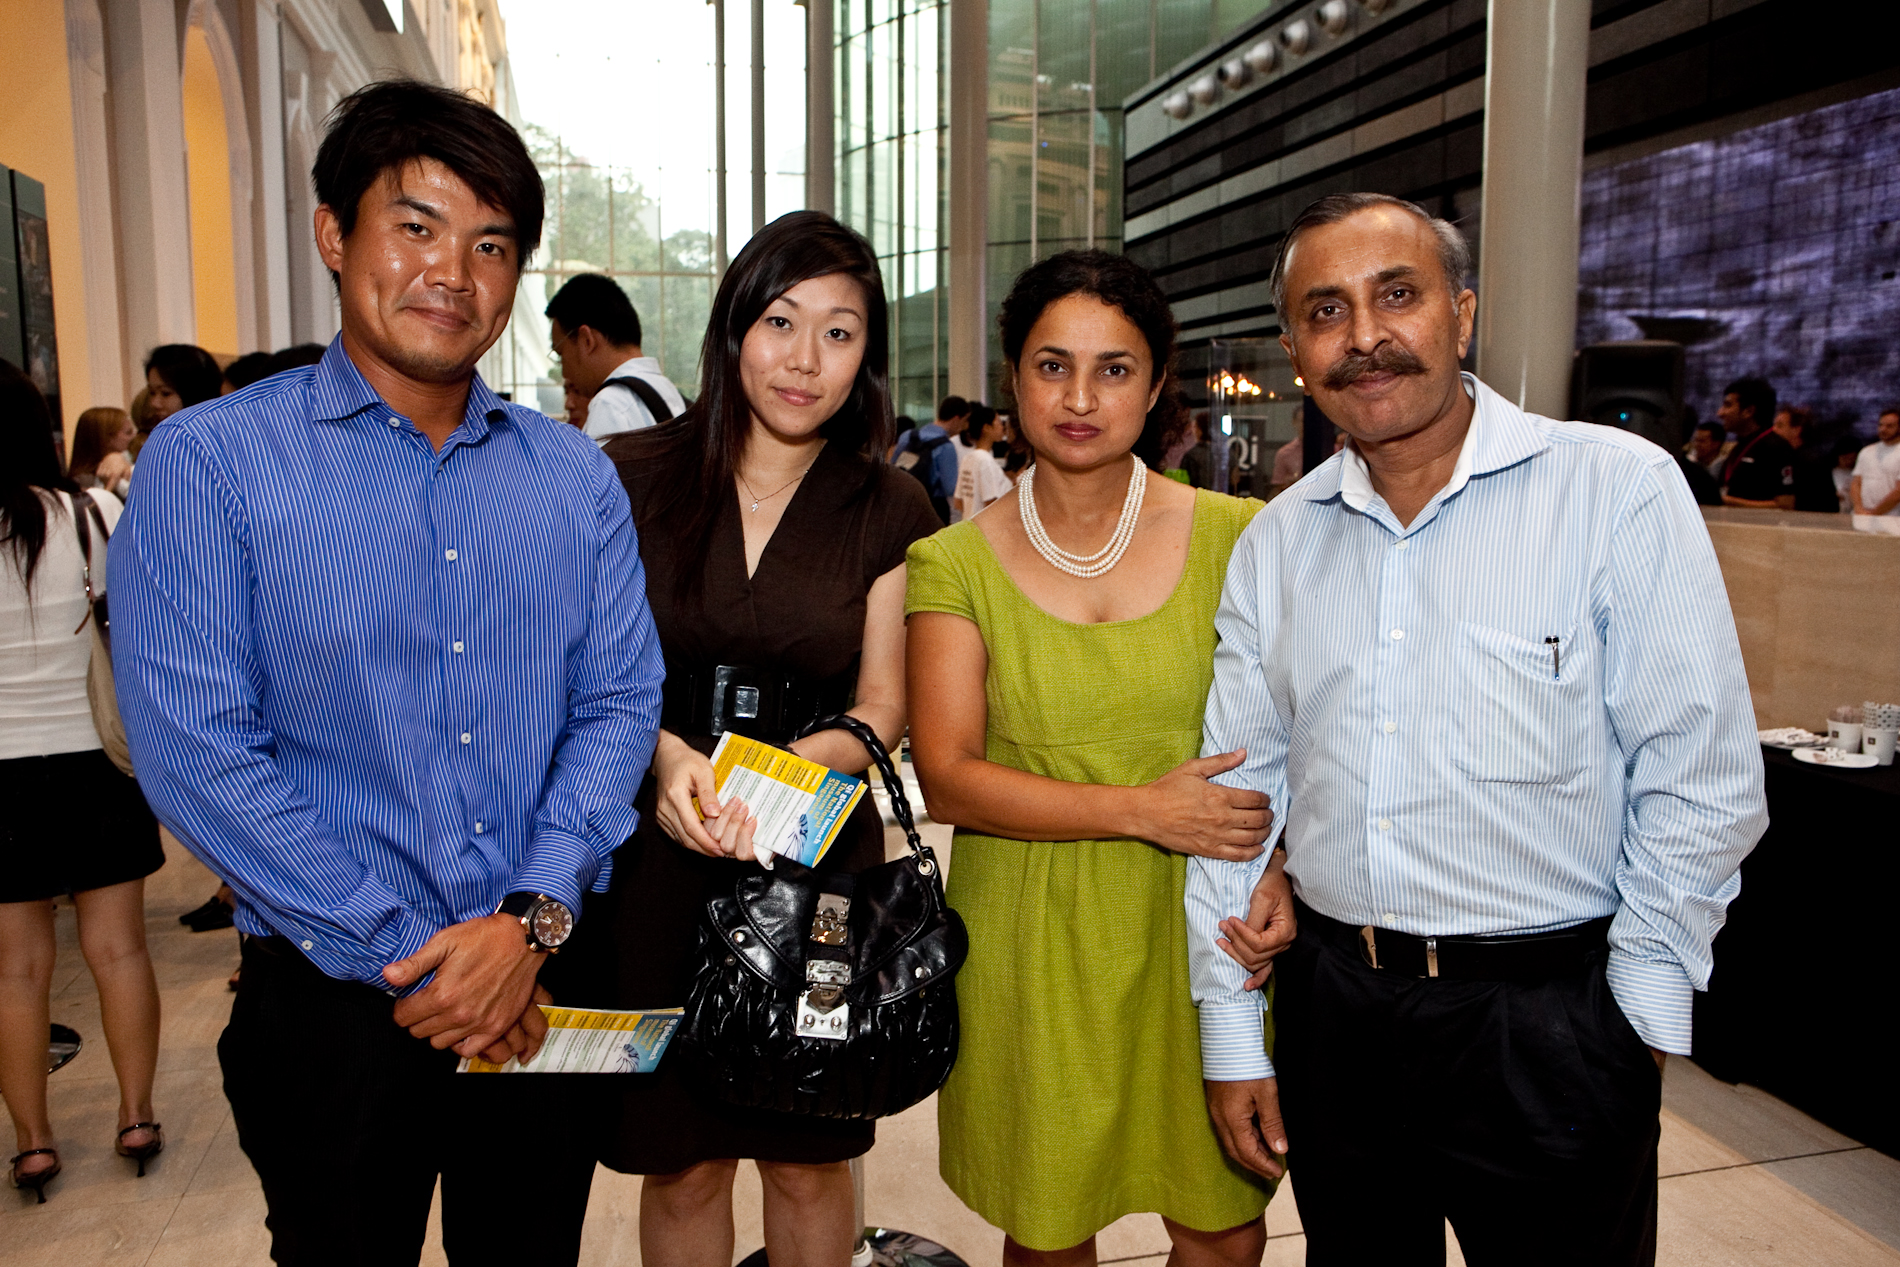 qi-global-2009-sustaible-design-singapore-057.jpg